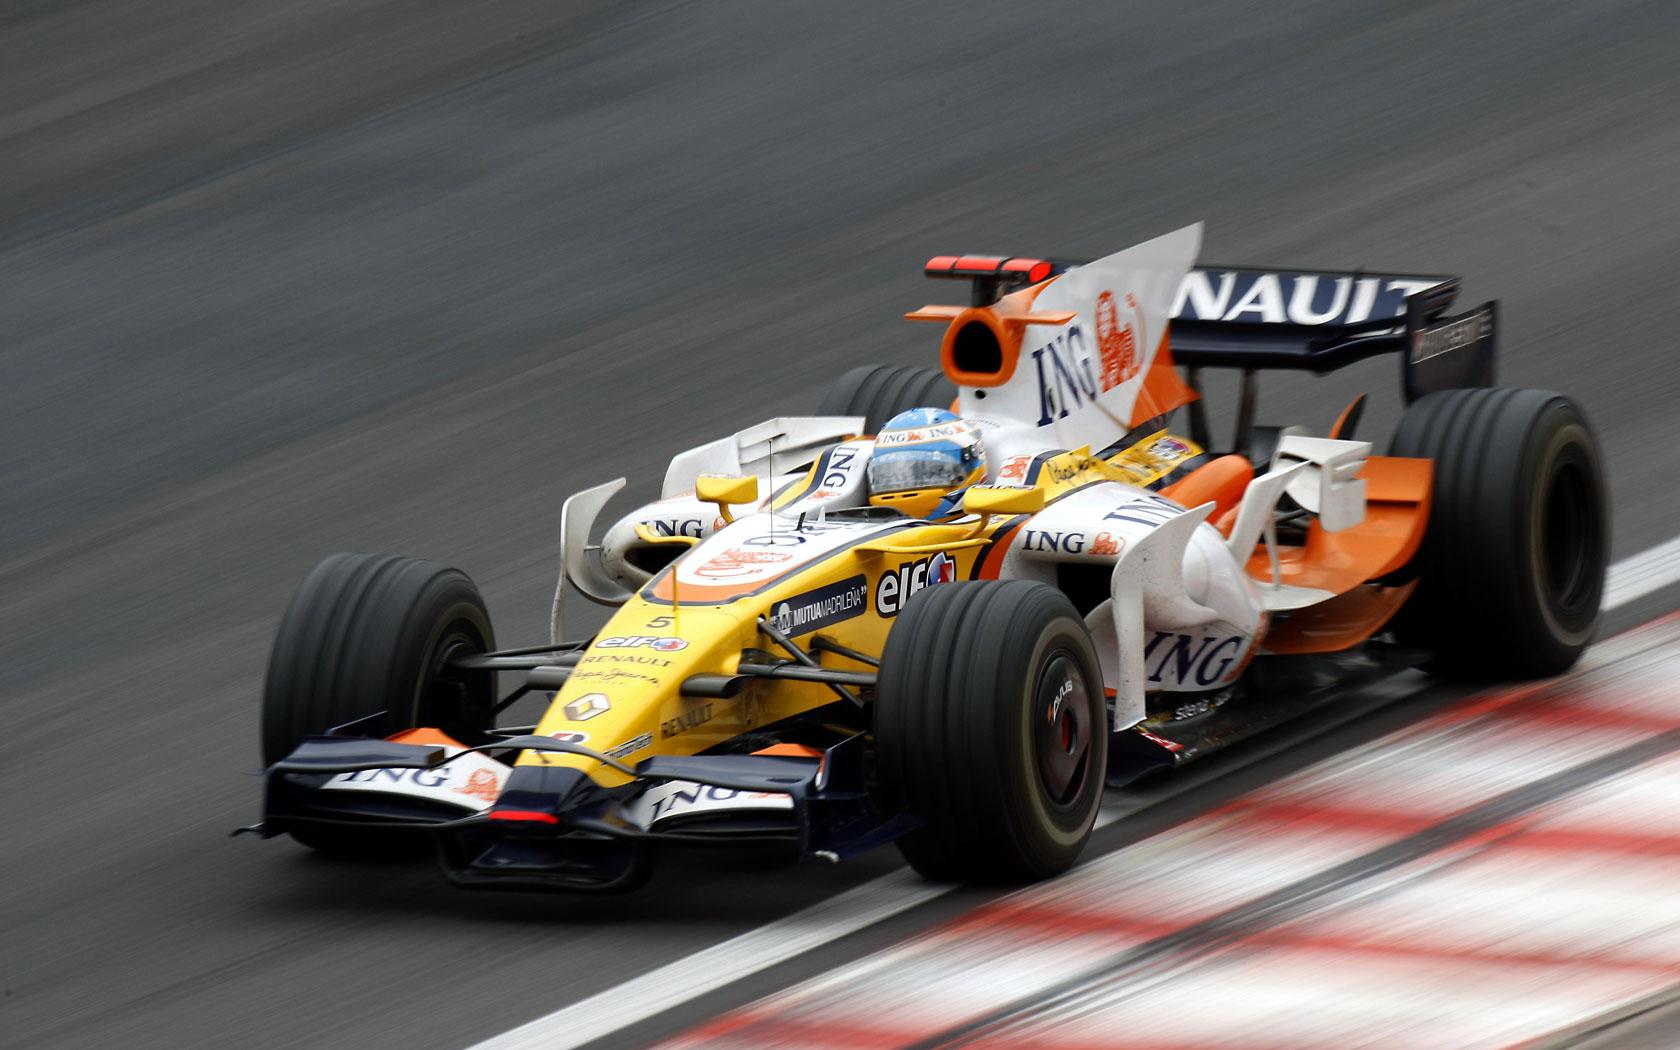 HD Wallpapers 2008 Formula 1 Grand Prix of Brazil | F1-Fansite.com Red Bull Wallpaper